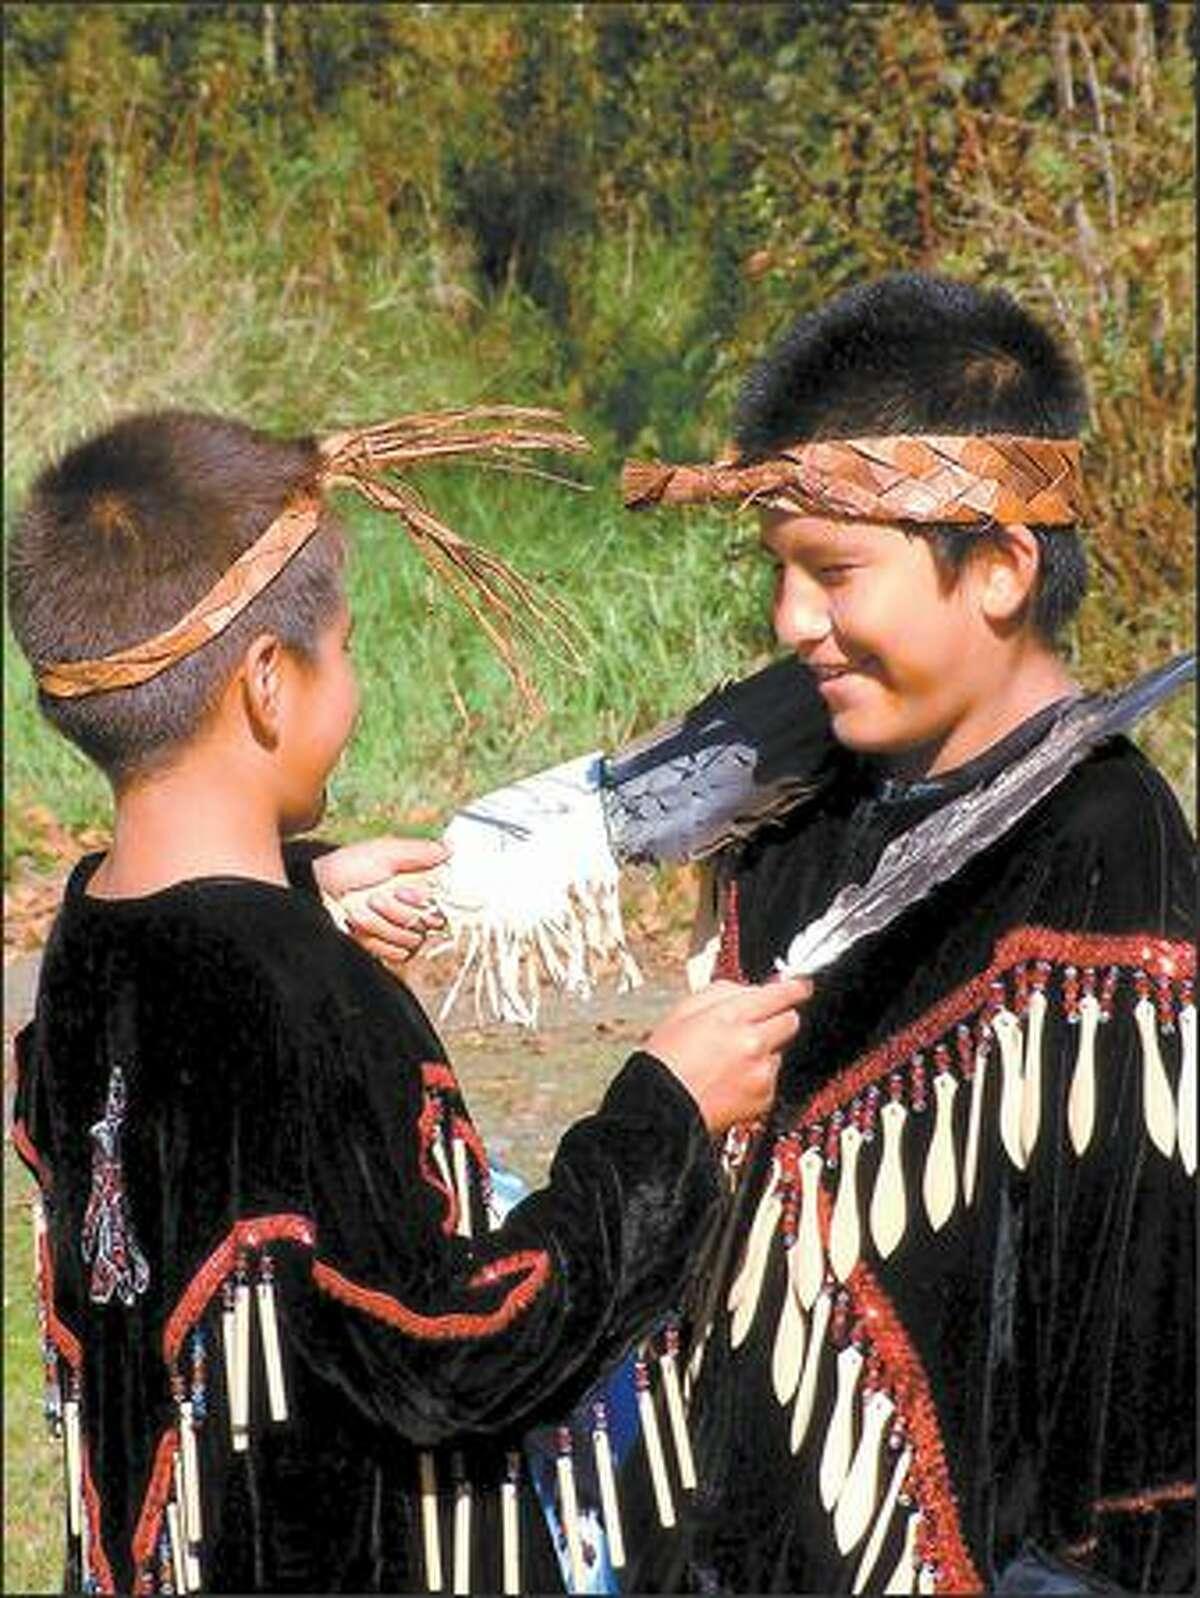 Children get ready to perform for a Sasquatch wildlife/culture tour near Chehalis.